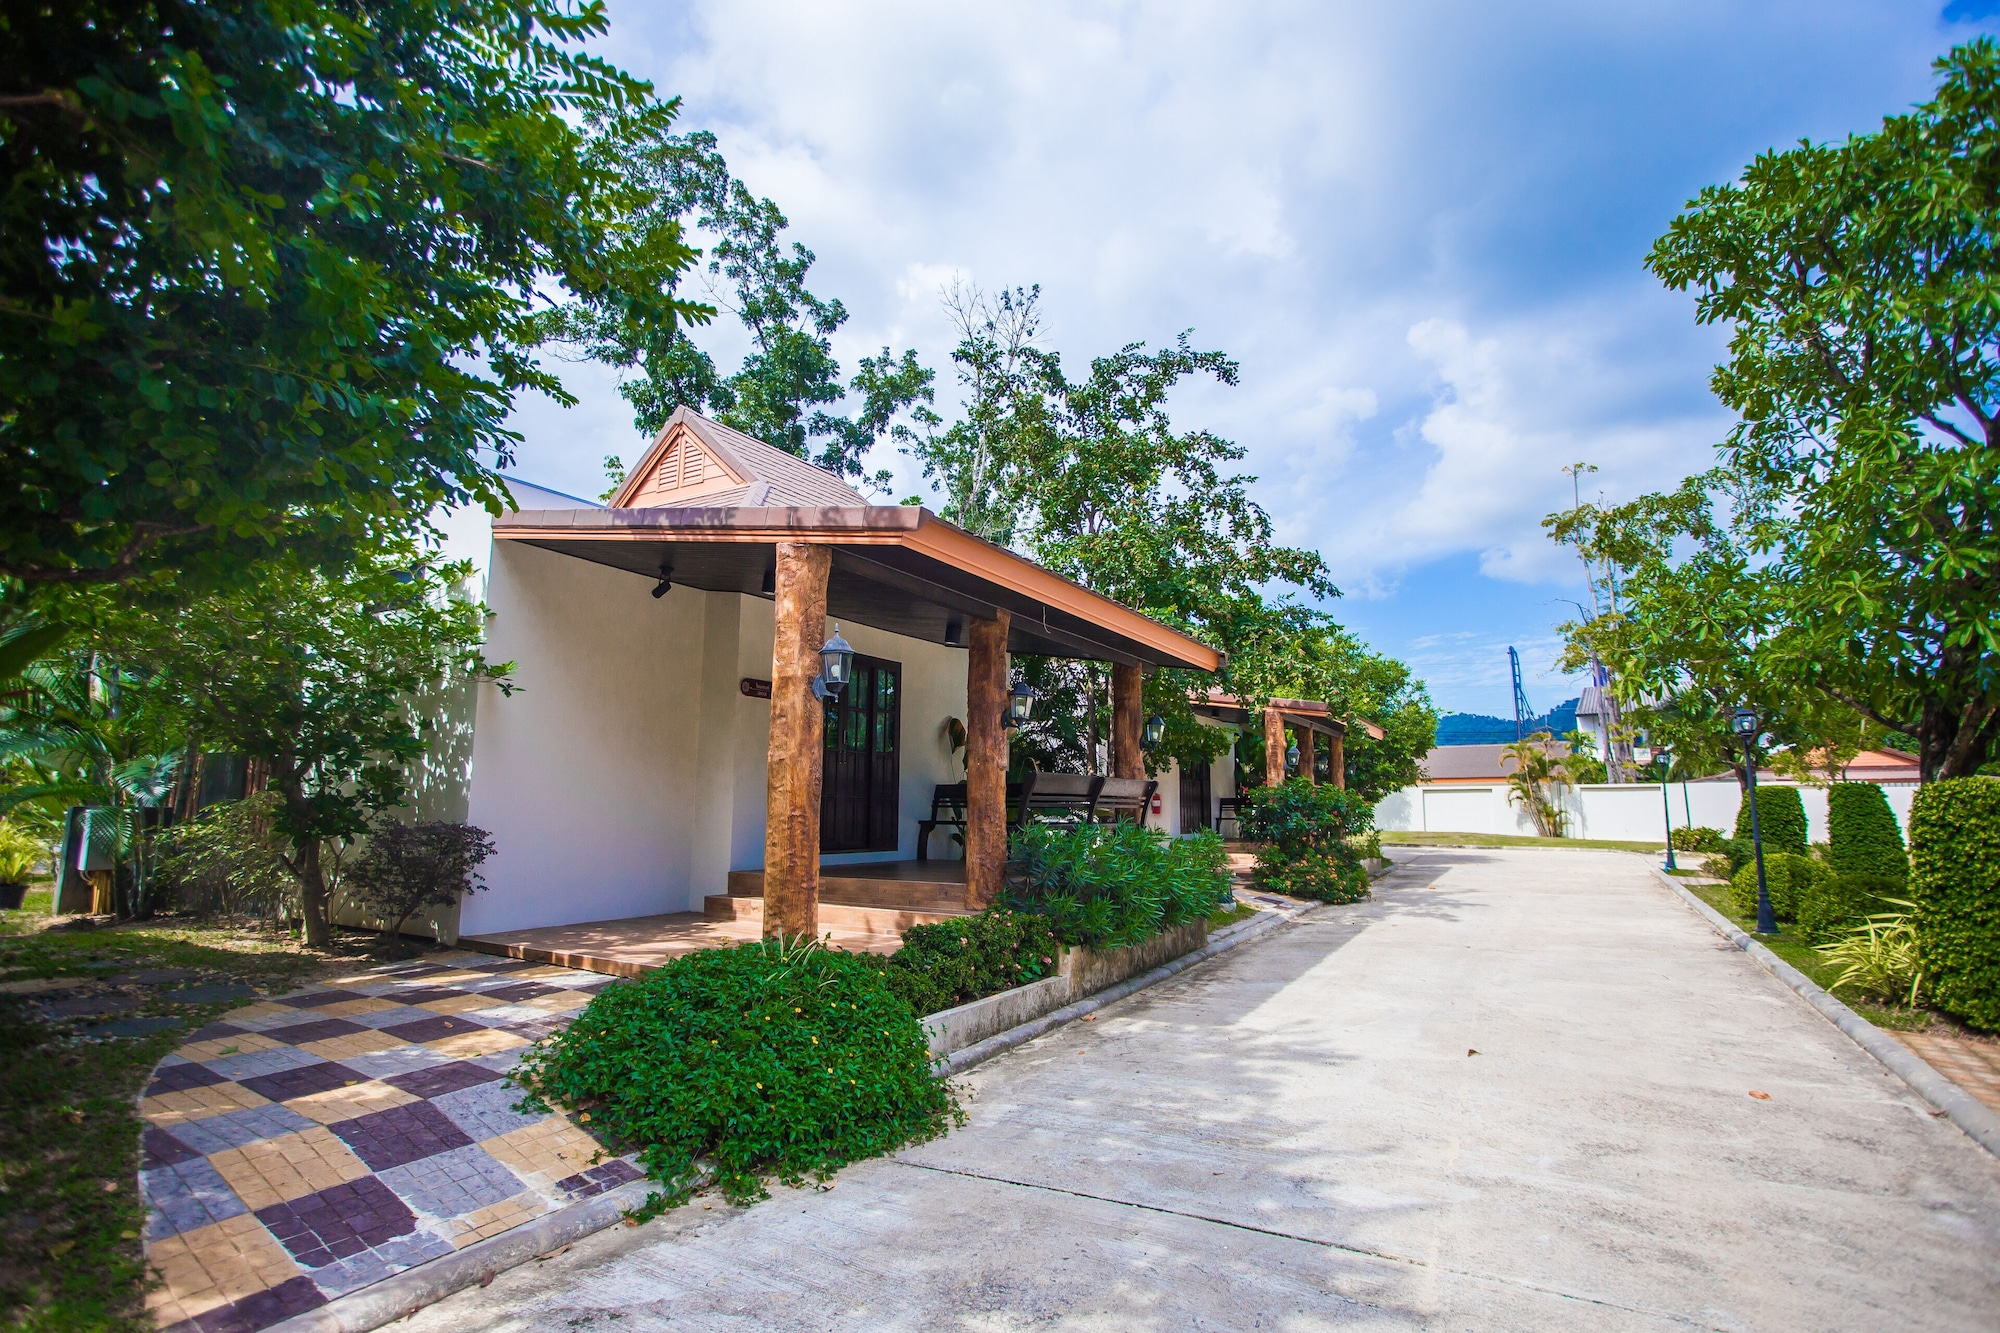 Capital O 370 Nernkhao Resort, Takua Thung